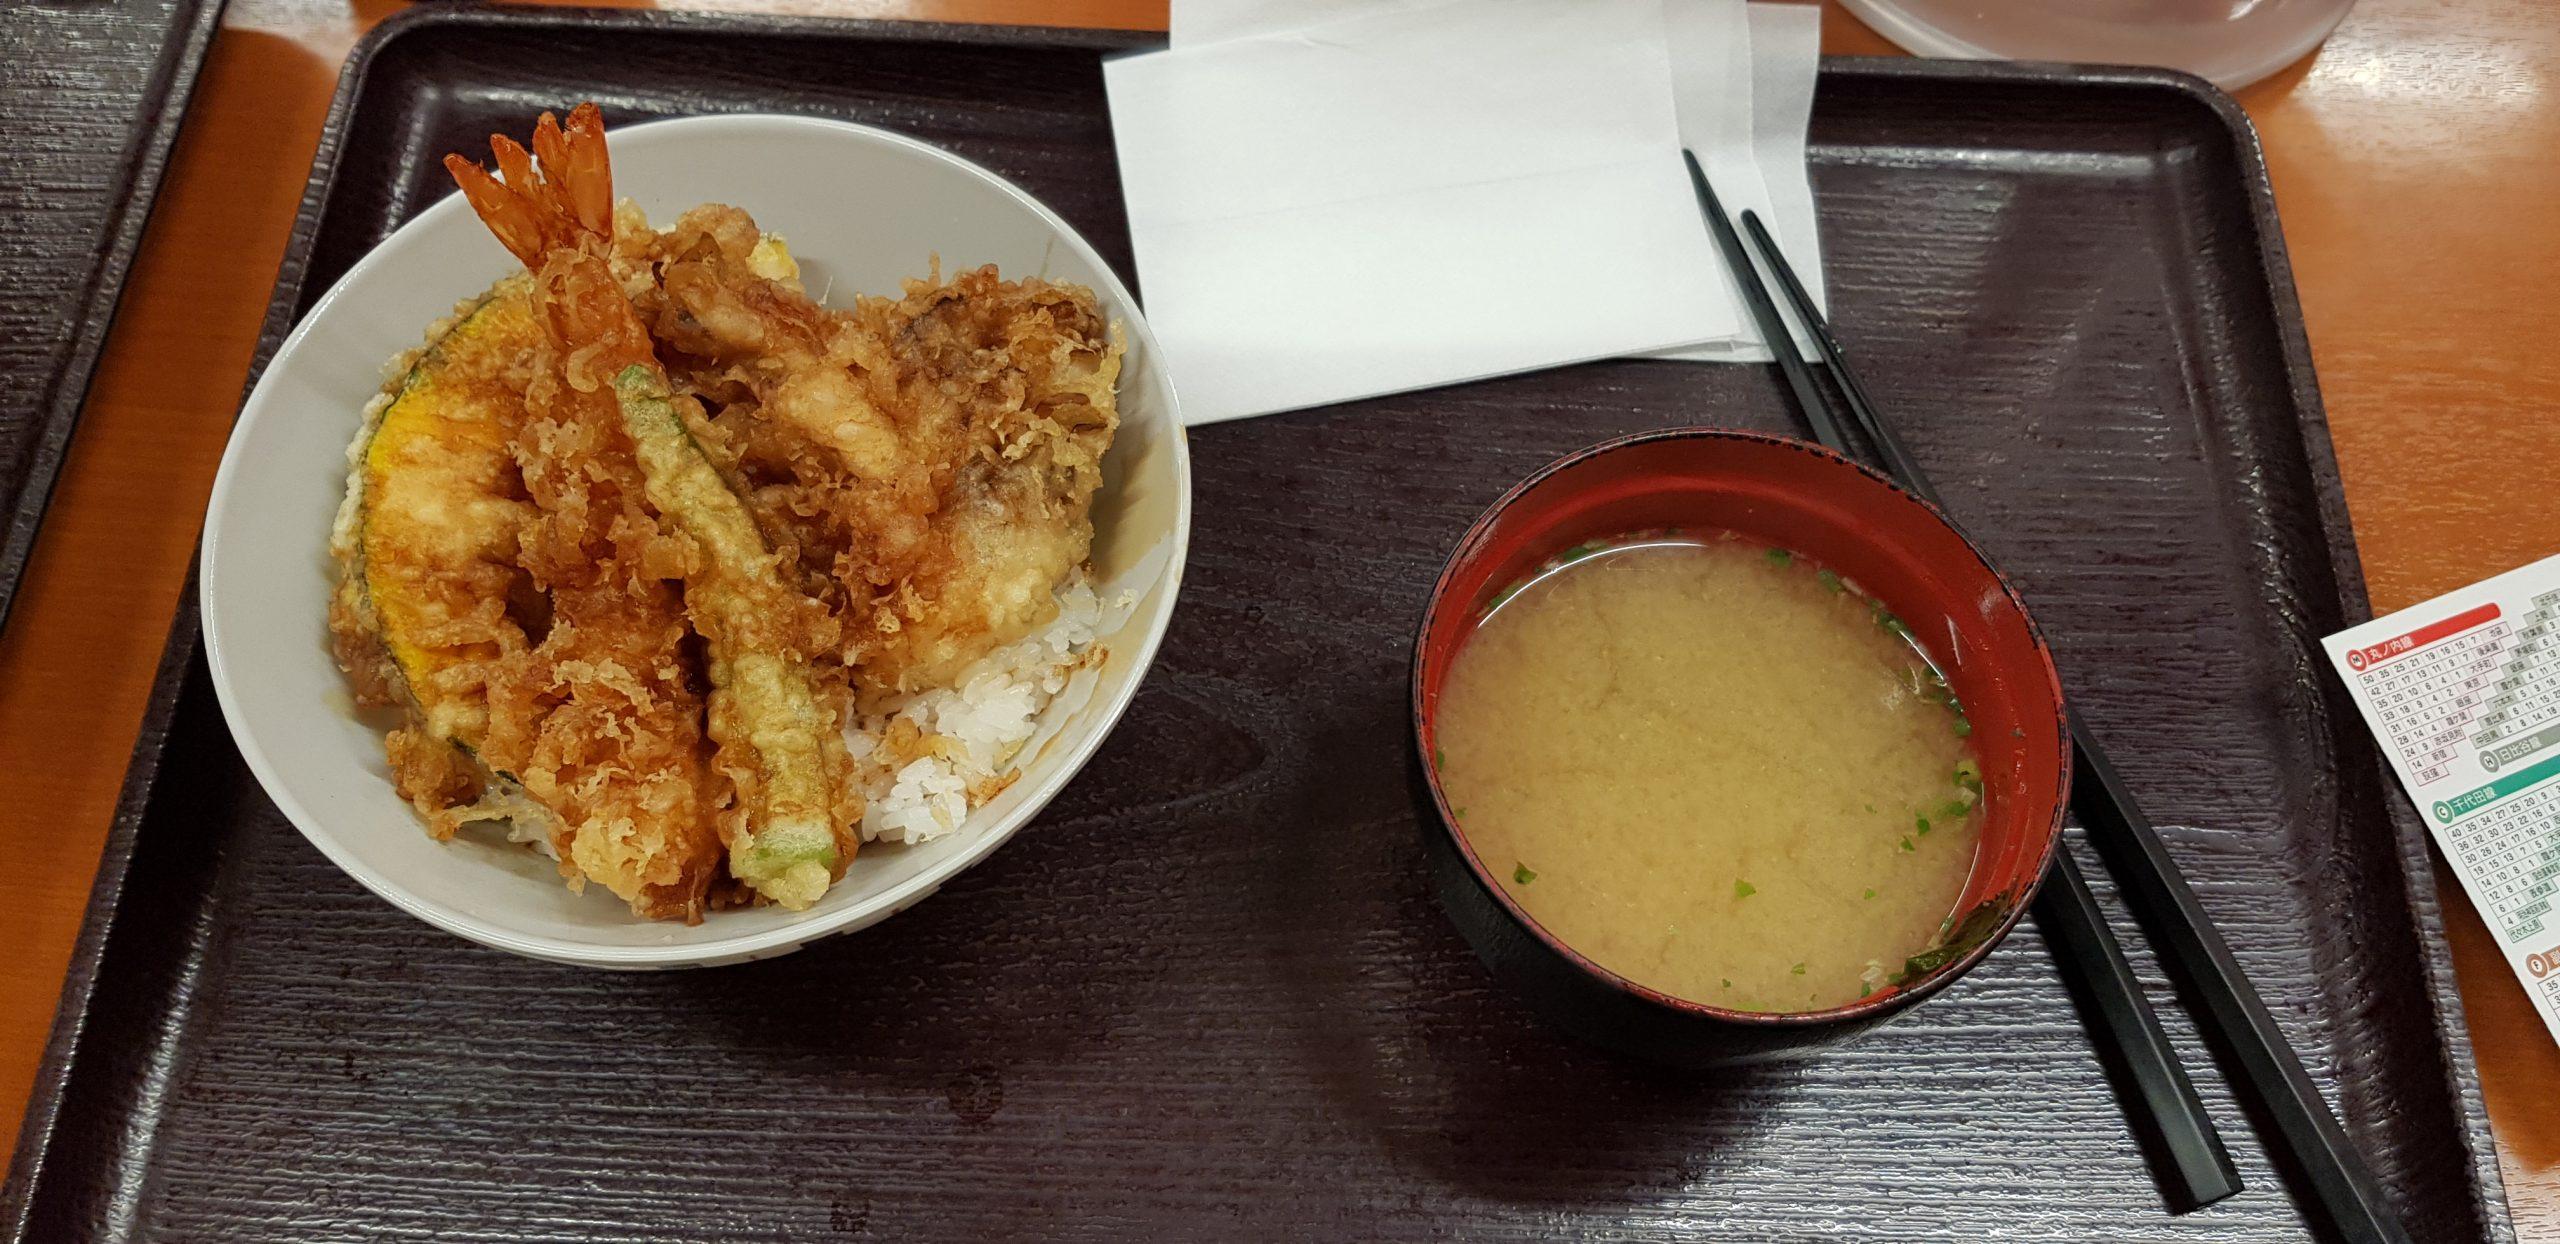 Tempura and miso soup